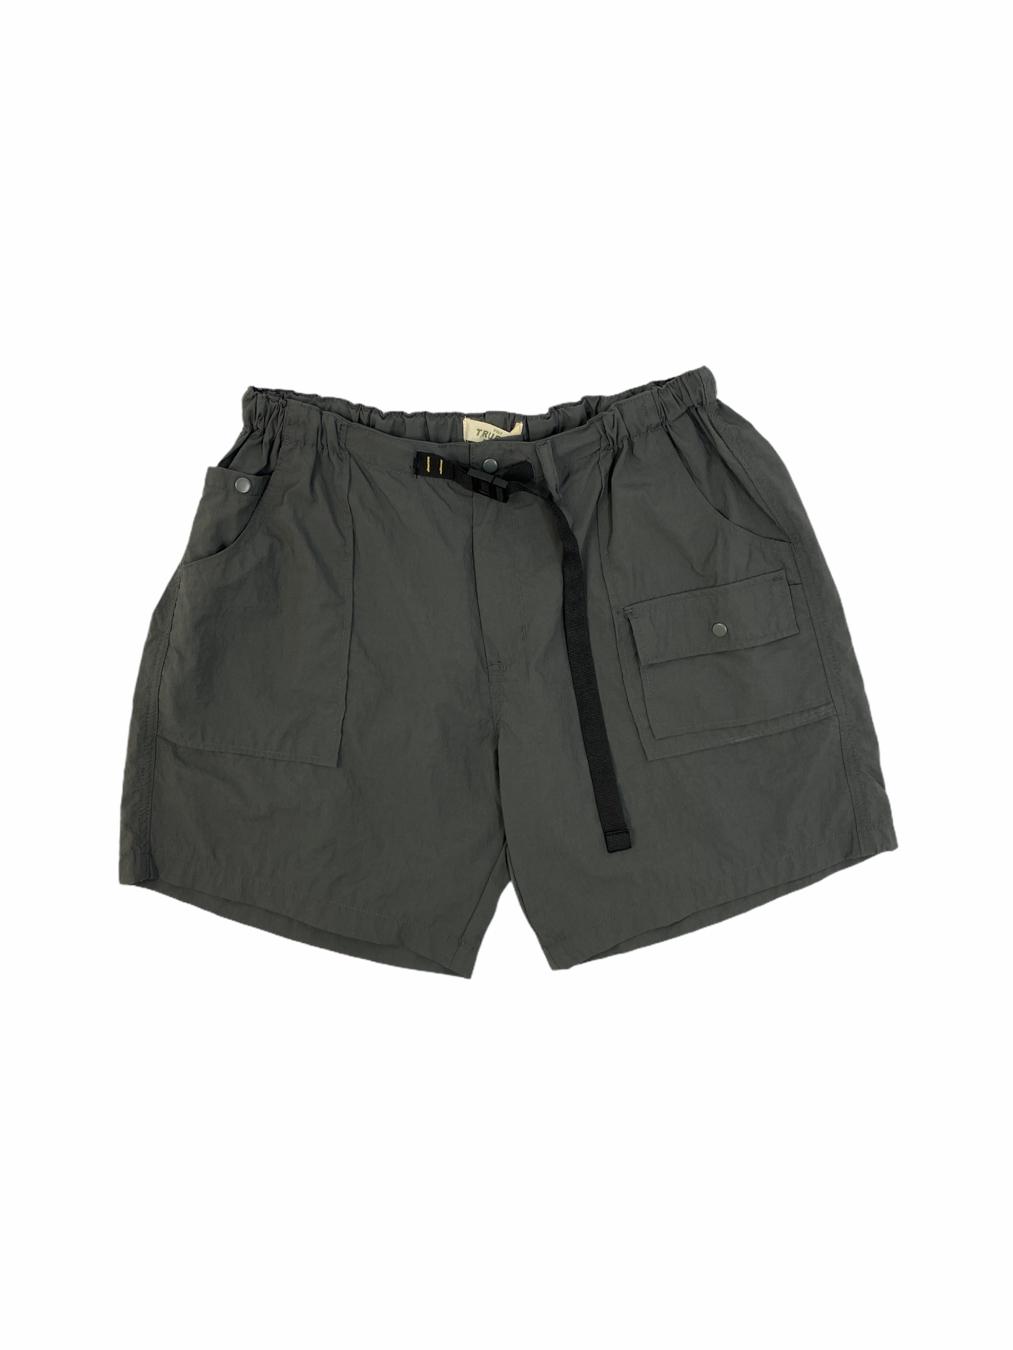 Nylon Pants (Gray)